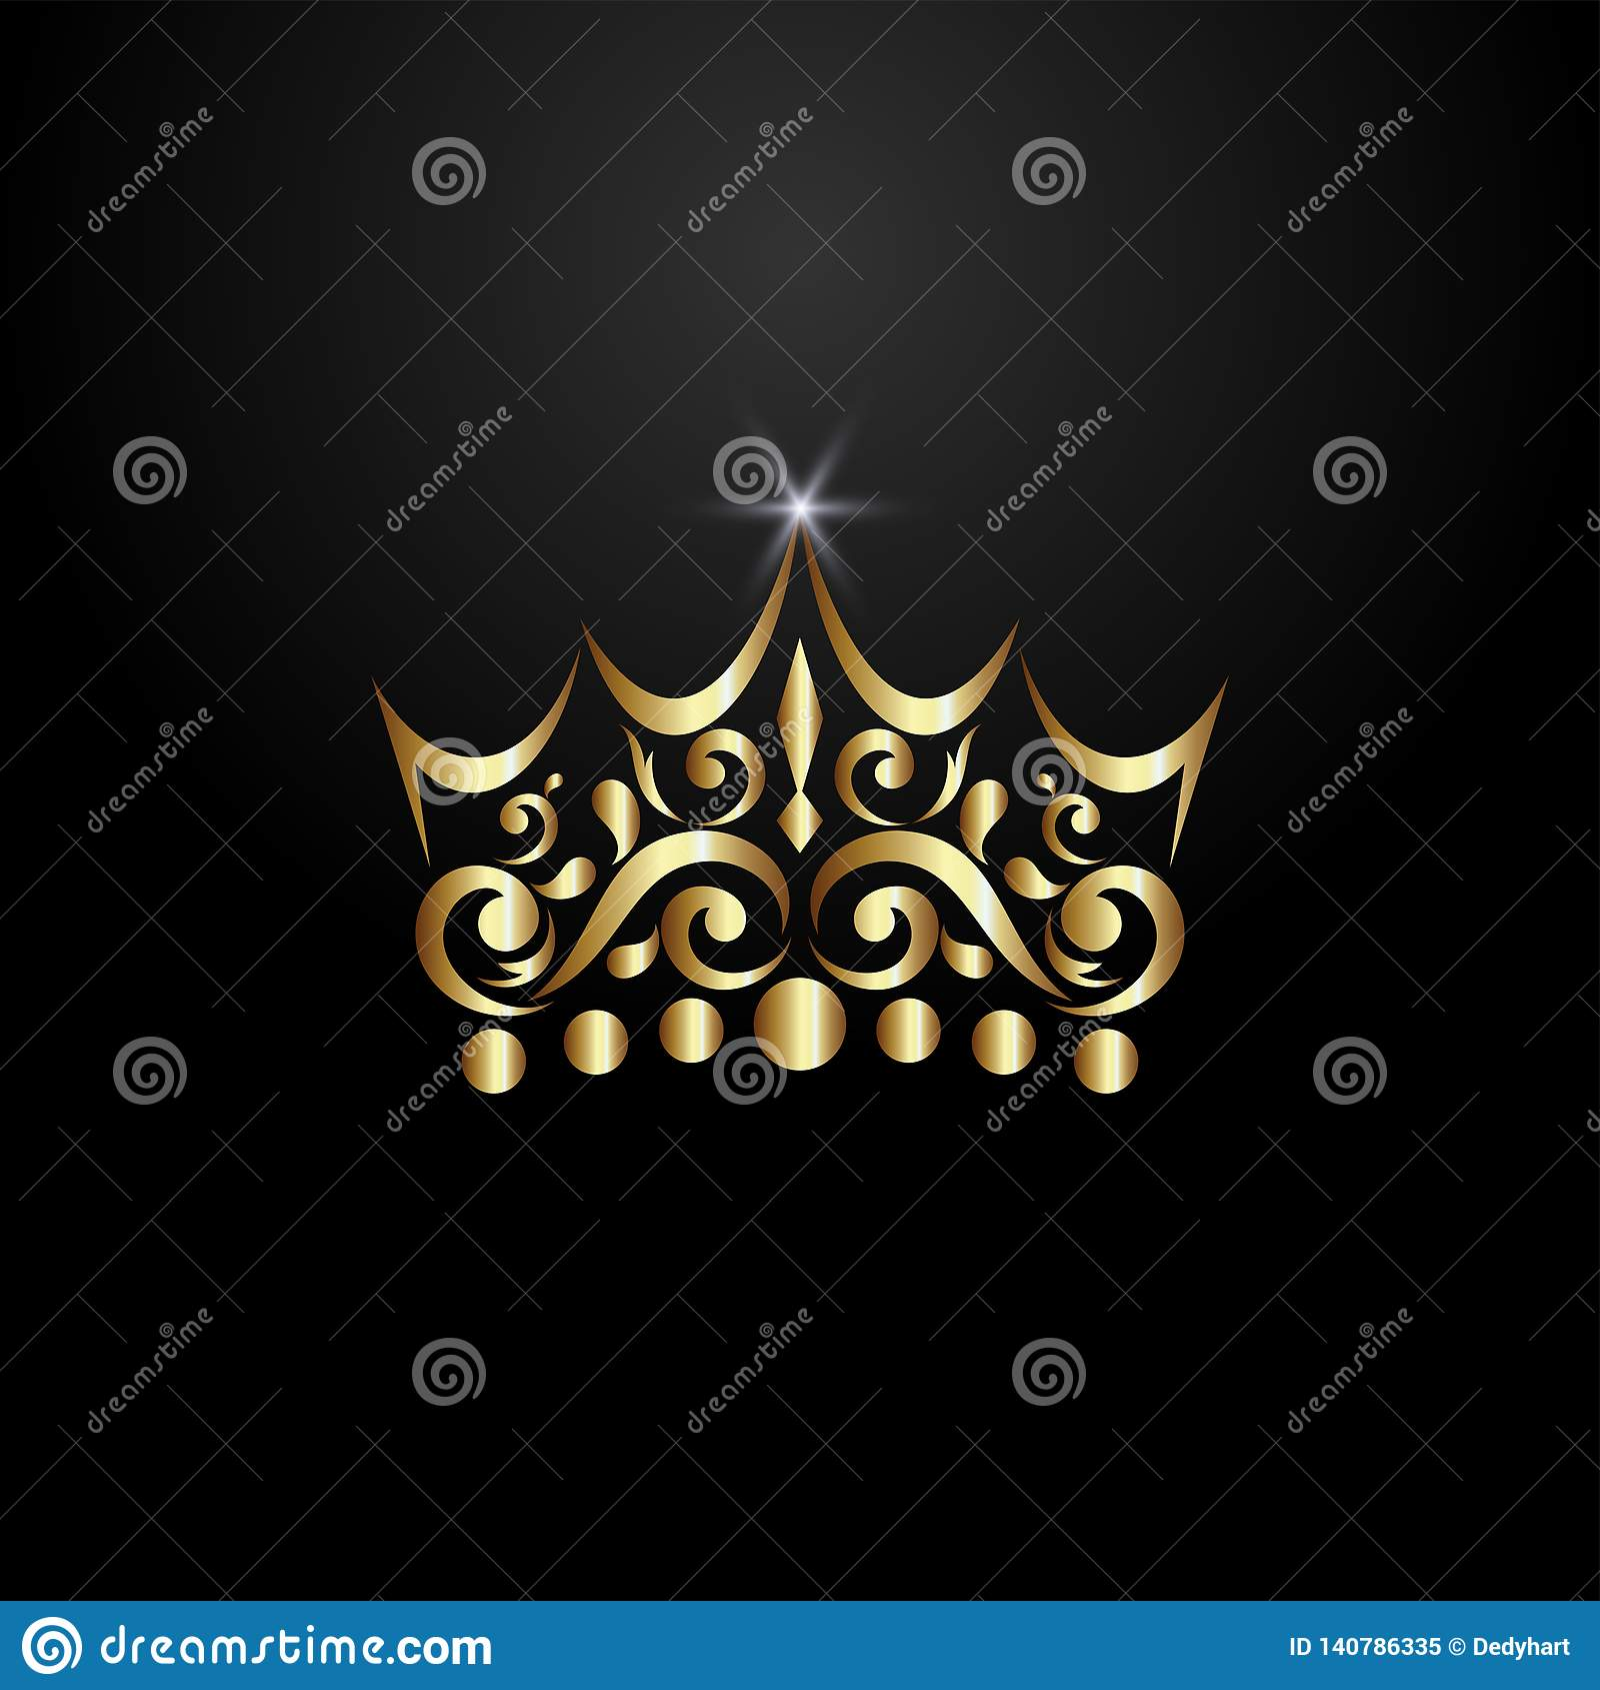 Luxury Crown Logo Stock Vector. Illustration Of Letter